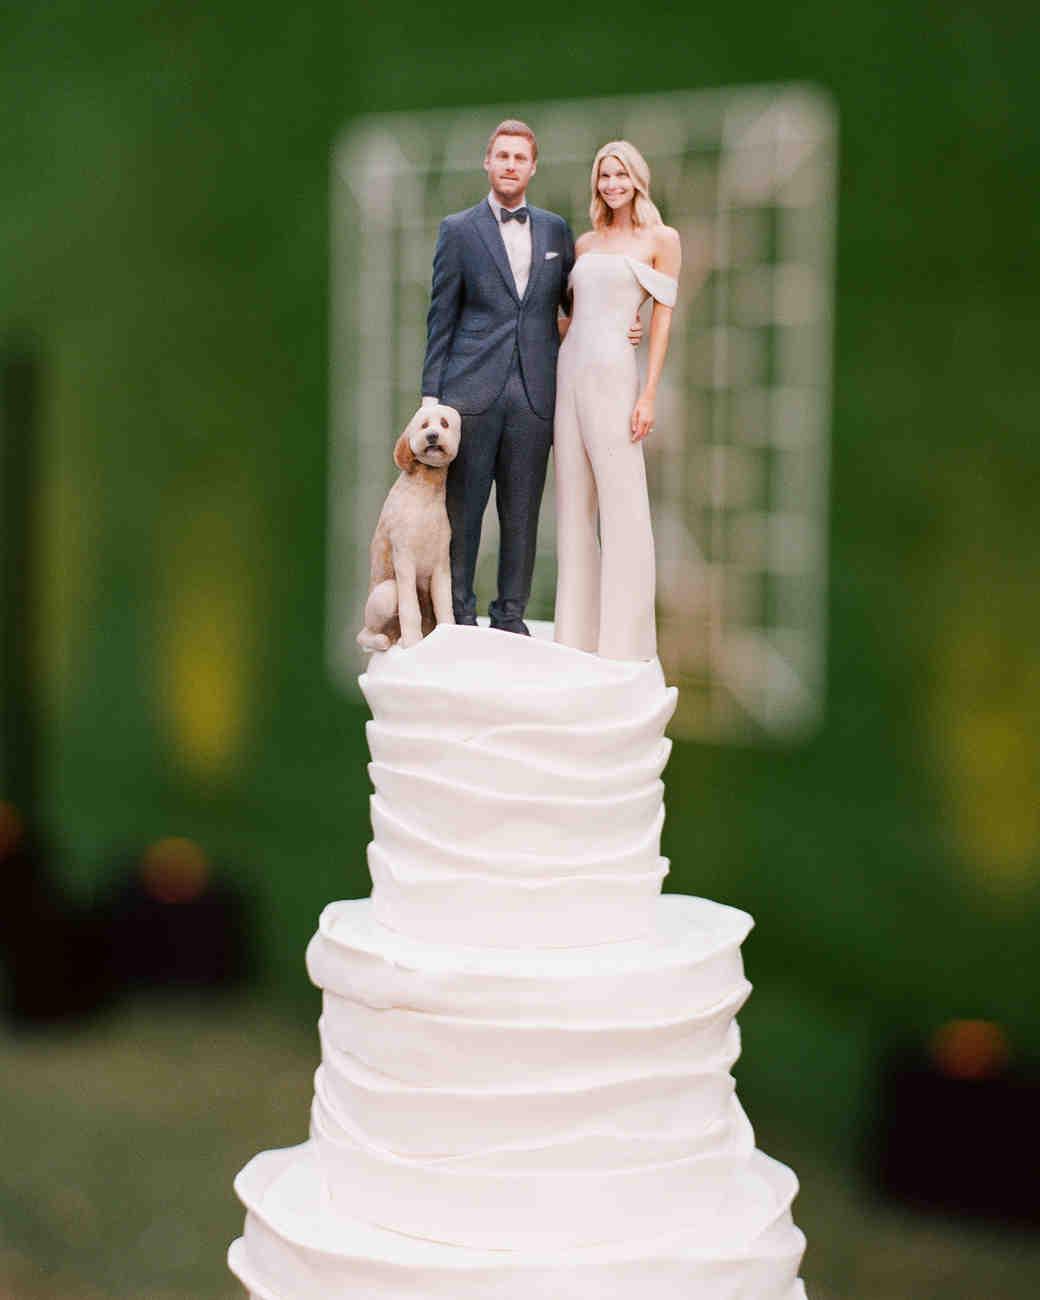 ashlie adam alpert wedding cake 3d printing topper